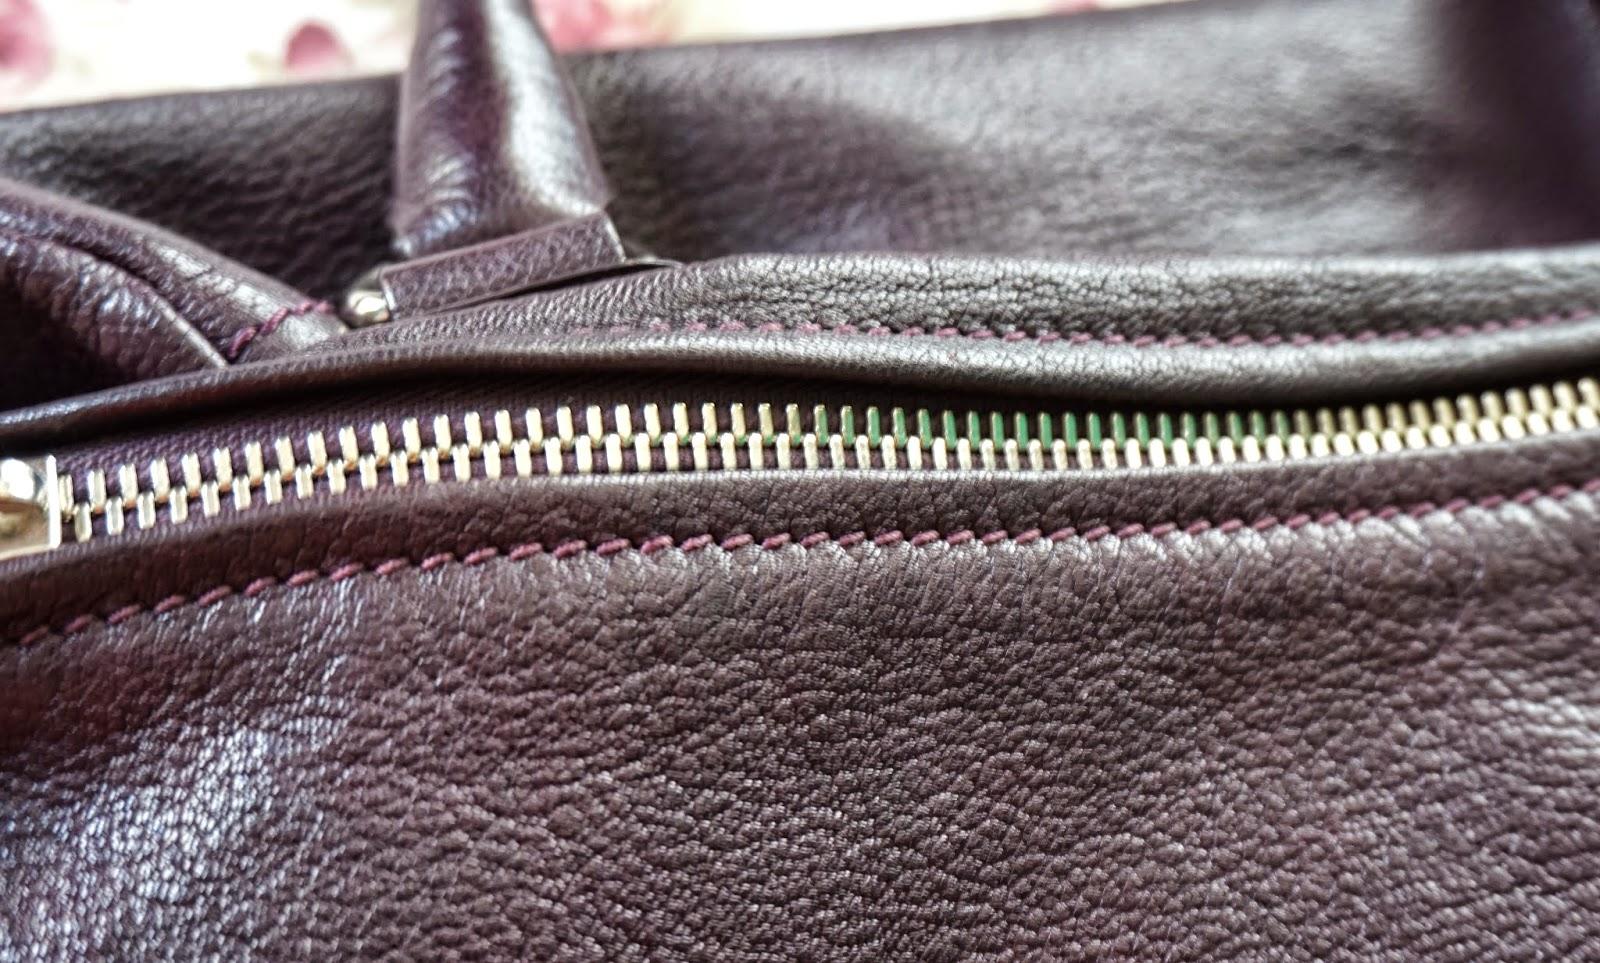 9a79b3002f1d BAG REVIEW  Givenchy Pandora Medium in Aube + Spot A Fake Givenchy ...